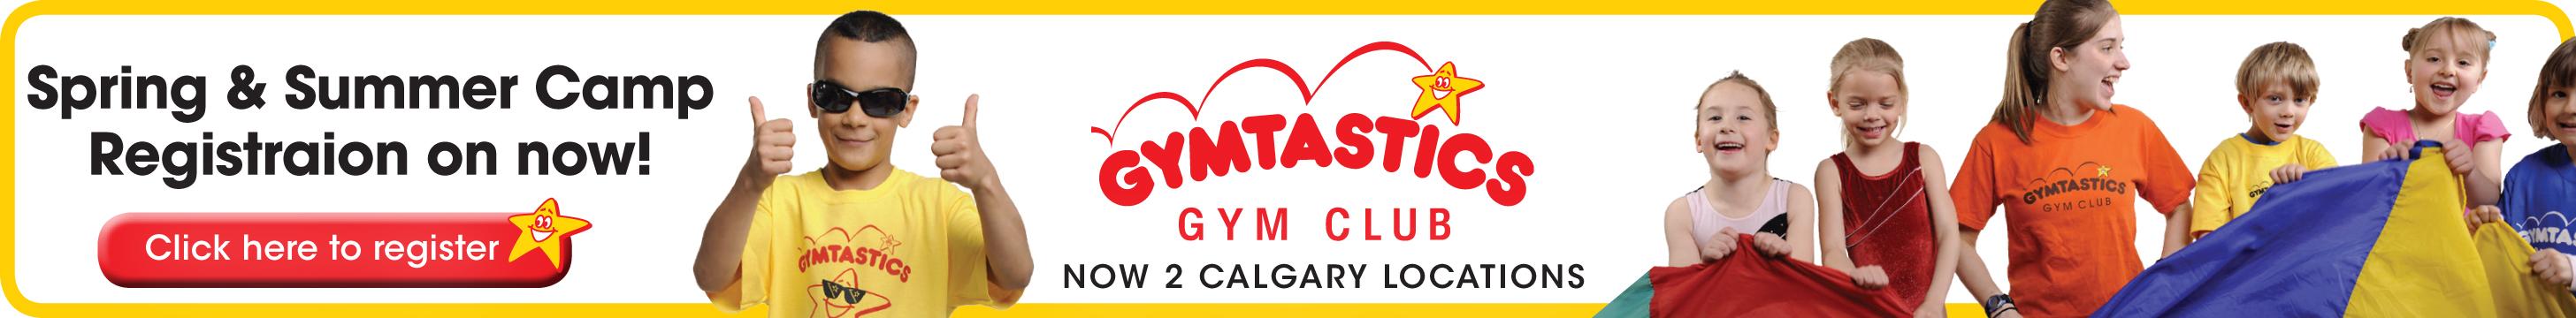 Gymtastics Feb 2015